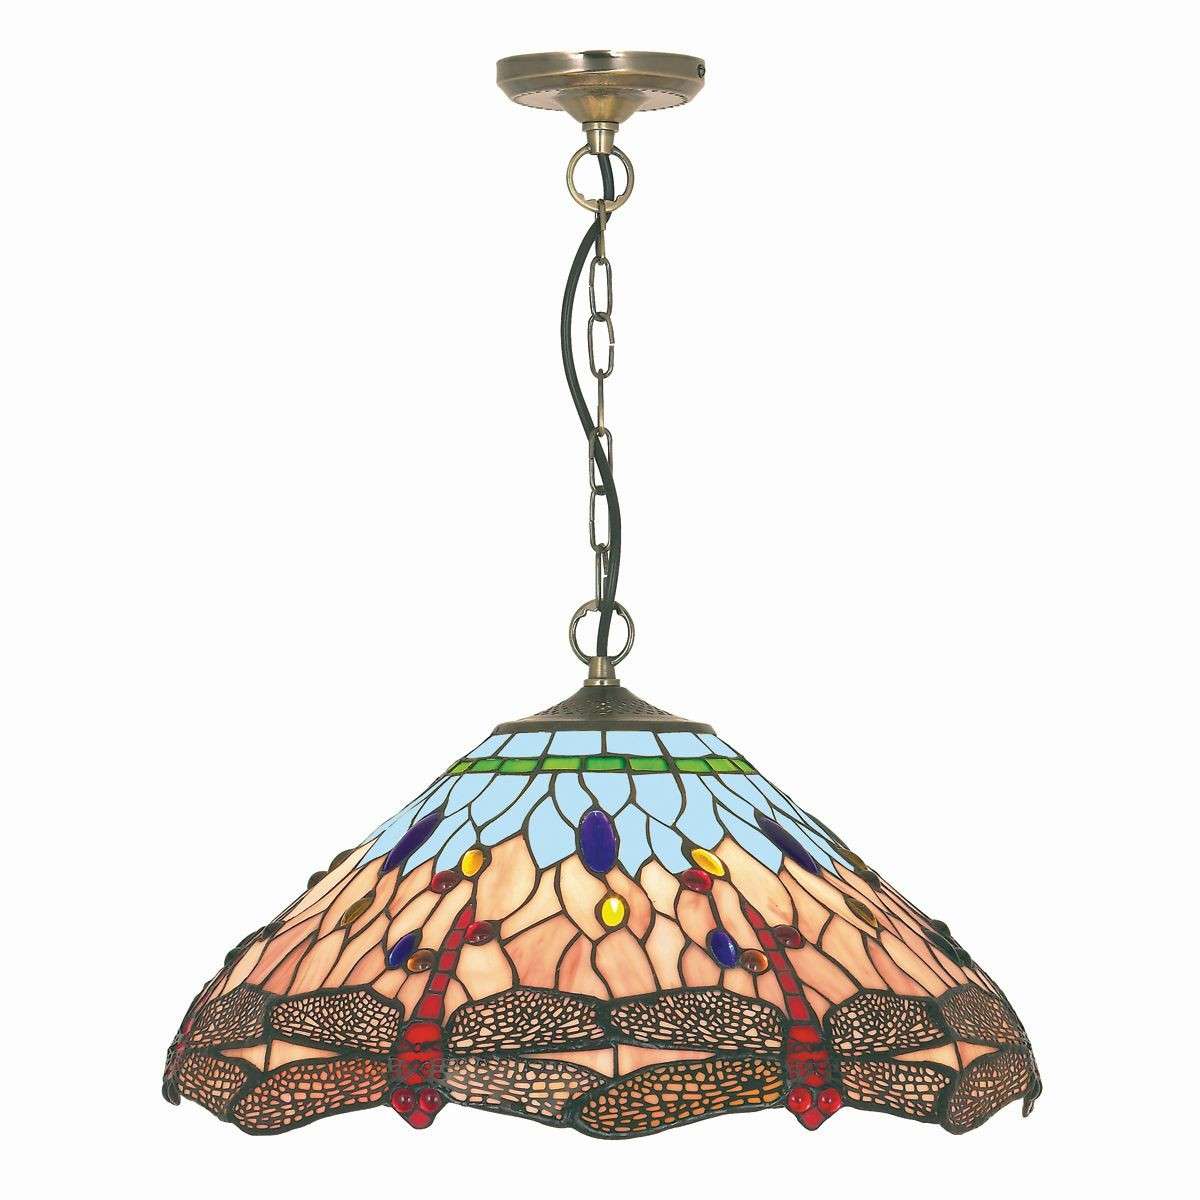 Dragonfly Tiffany Ceiling Light Pendant